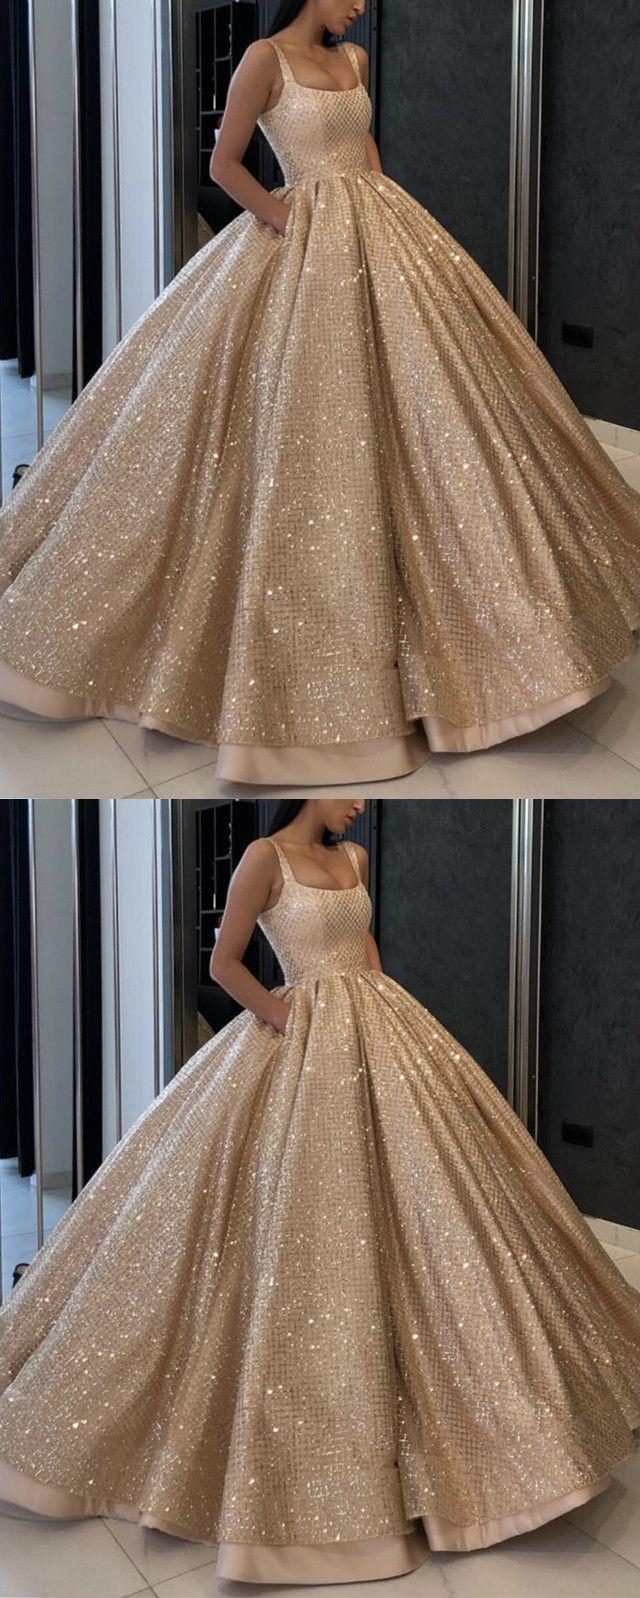 Bling Bling Gold Sequins Satin Ball Gown Wedding Dresses